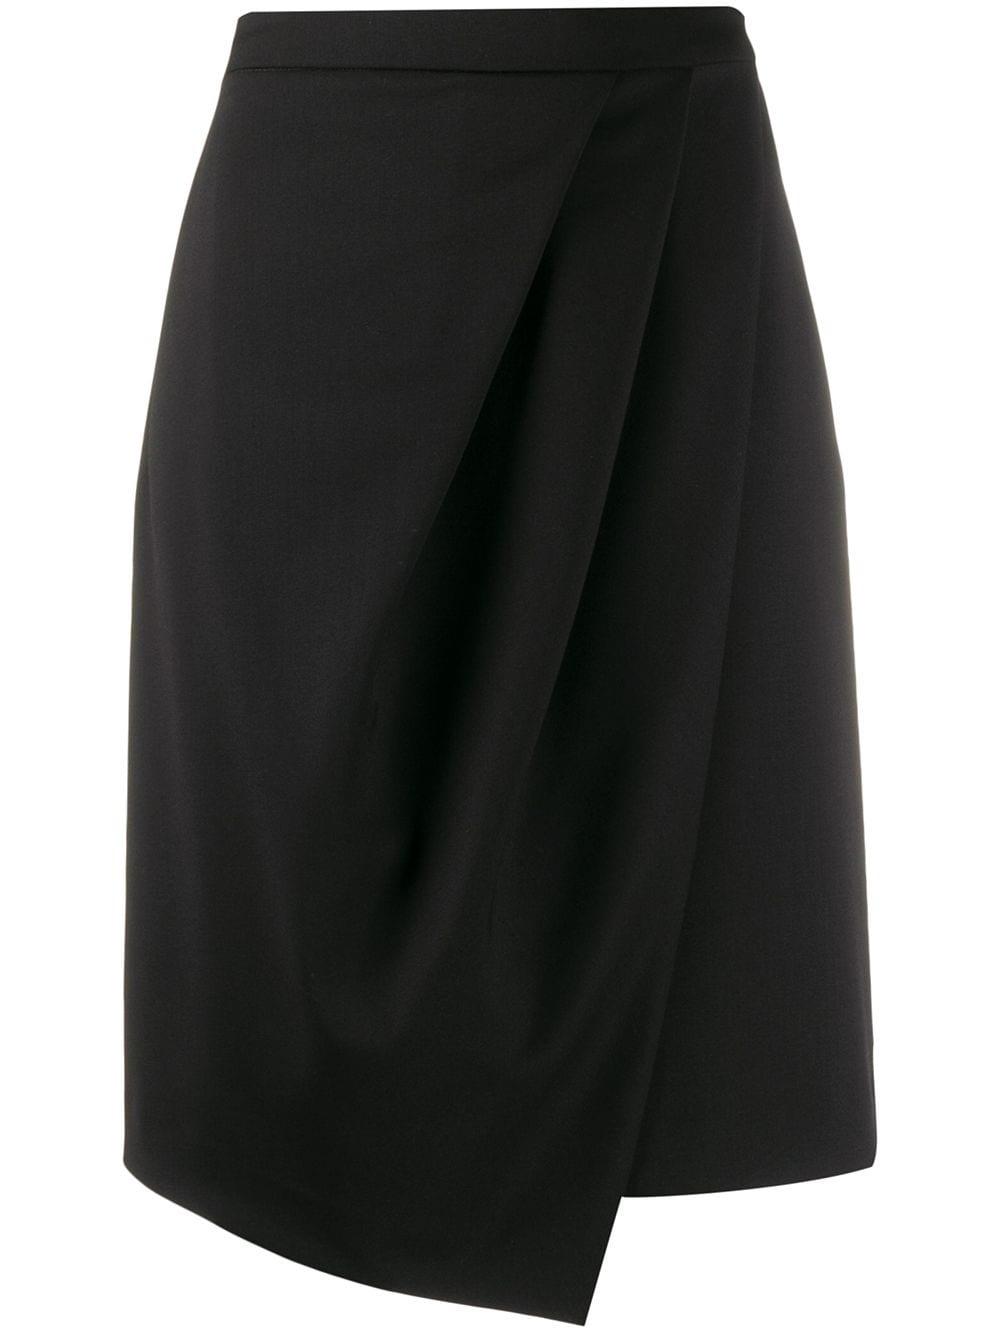 Karl Lagerfeld юбка-тюльпан Karl из коллаборации с Carine